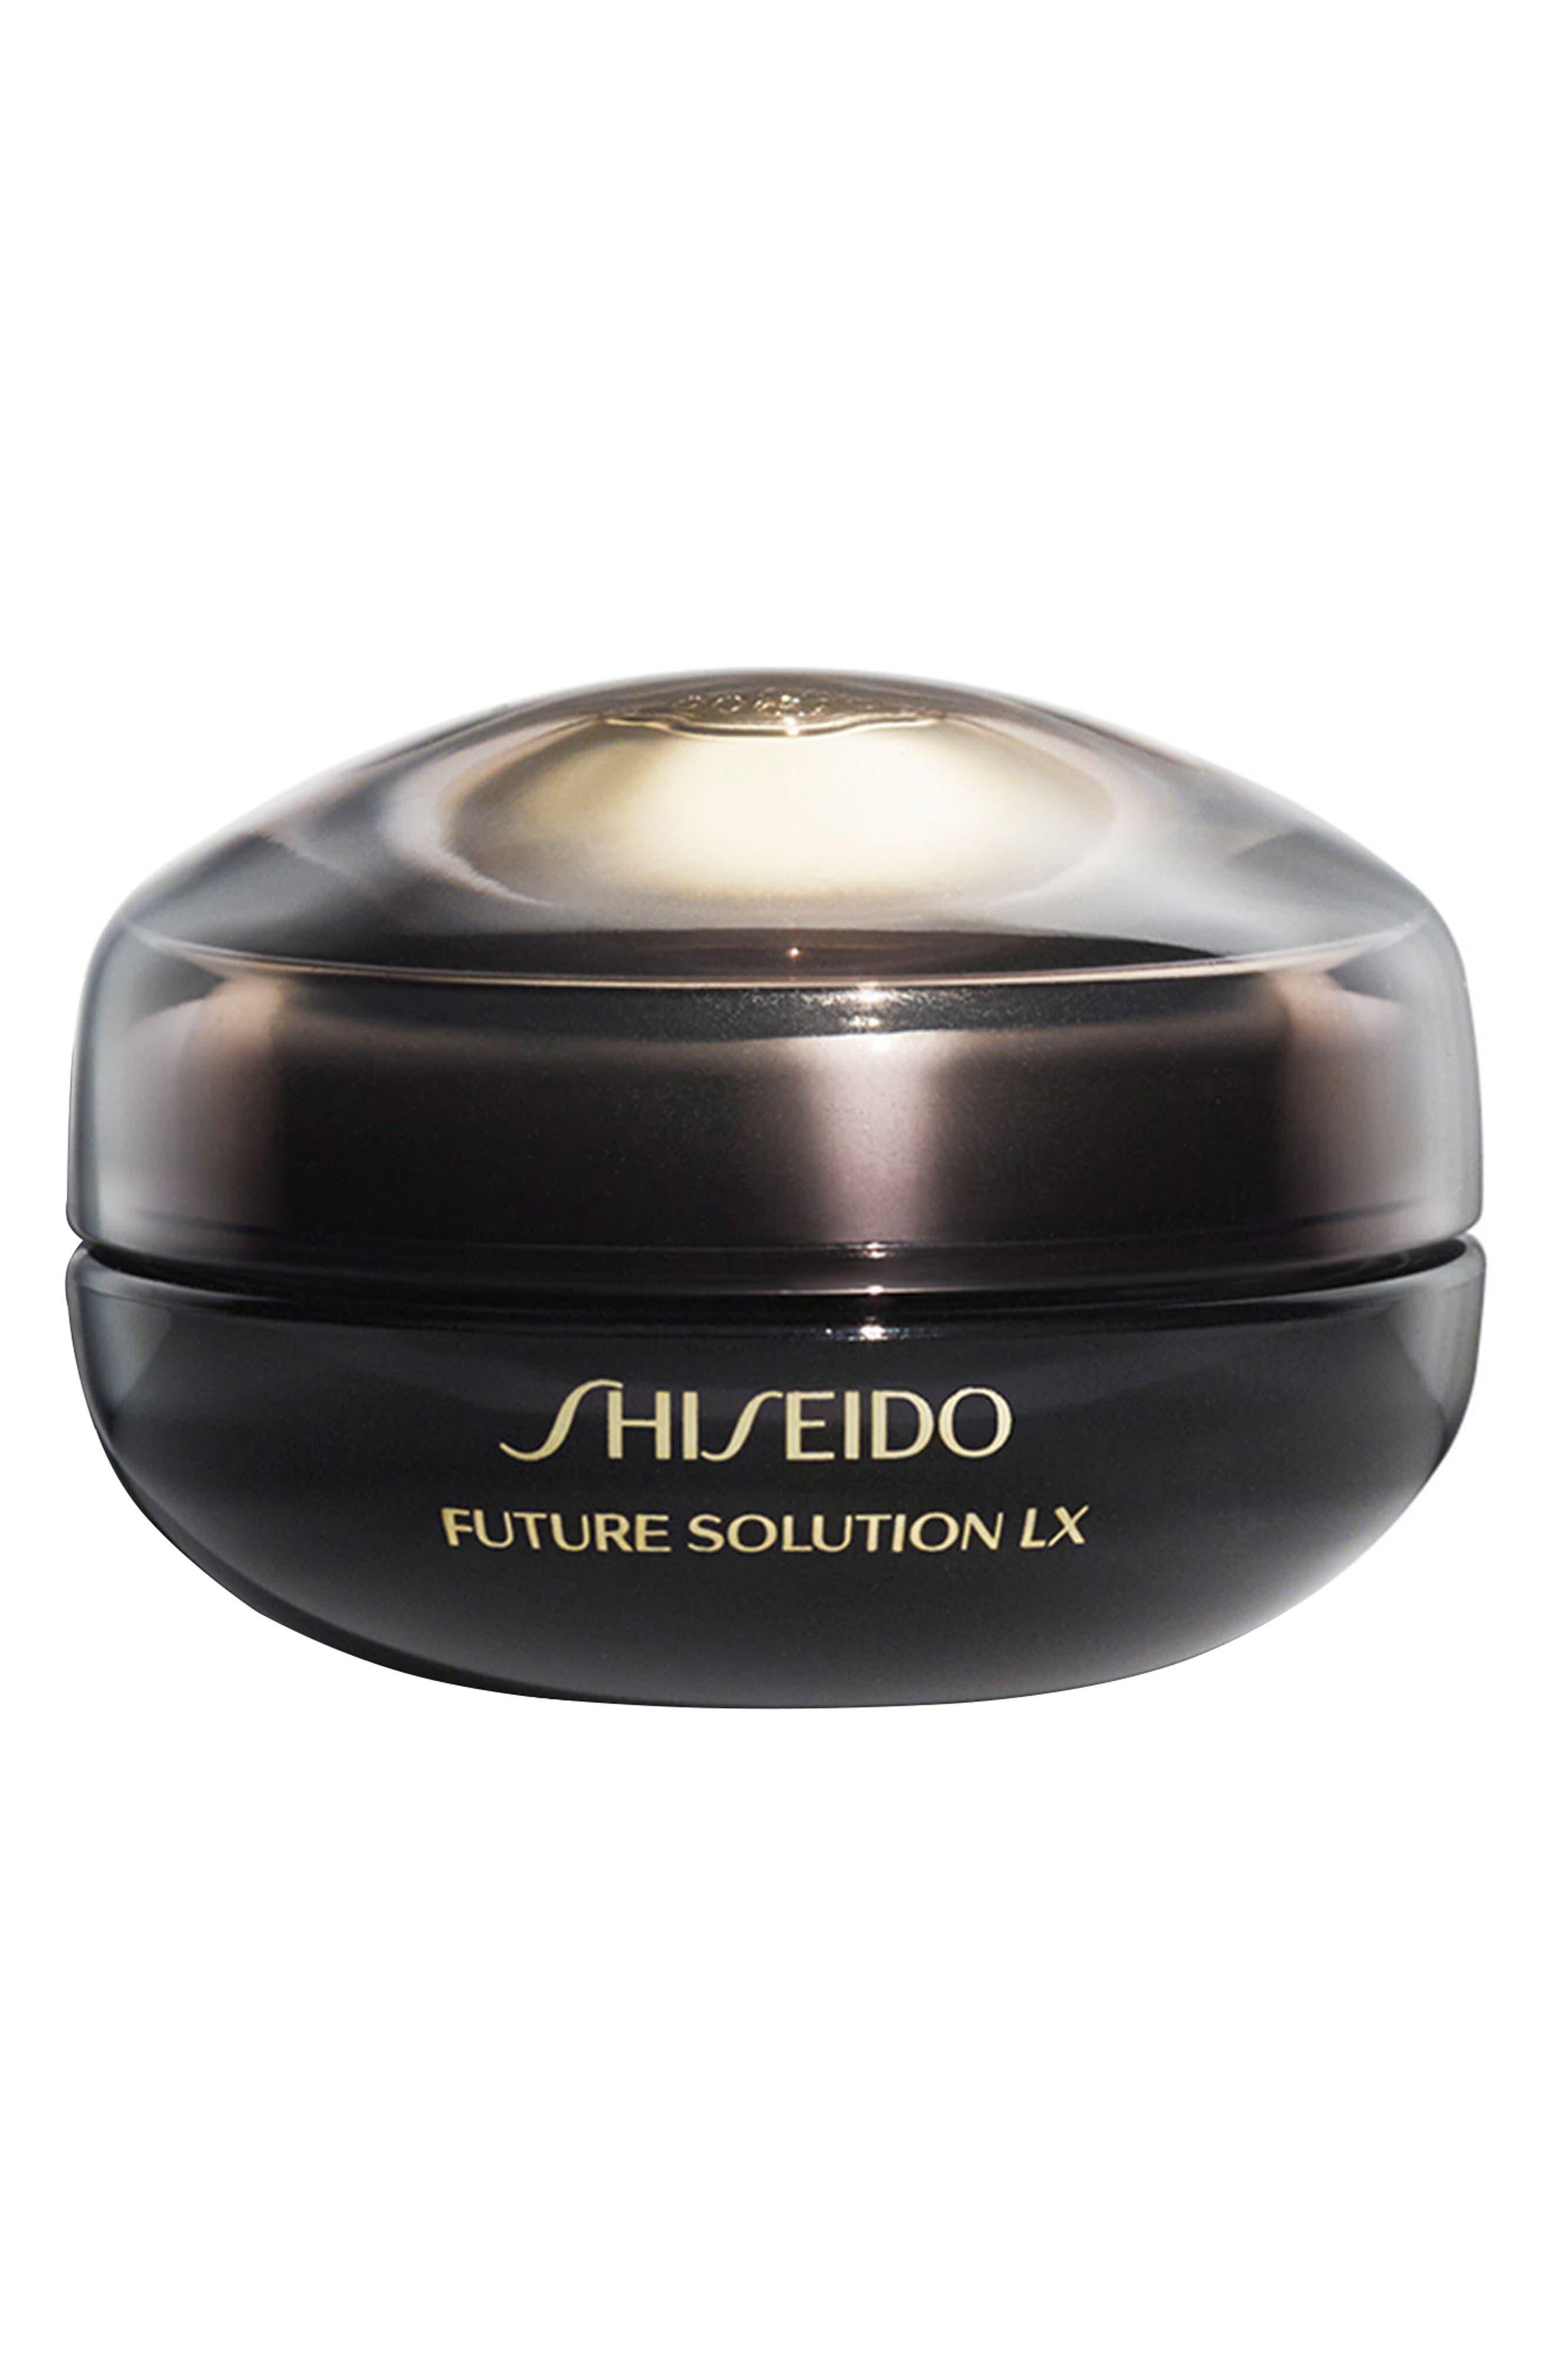 Future Solution LX Eye & Lip Contour Regenerating Cream,                             Main thumbnail 1, color,                             NO COLOR